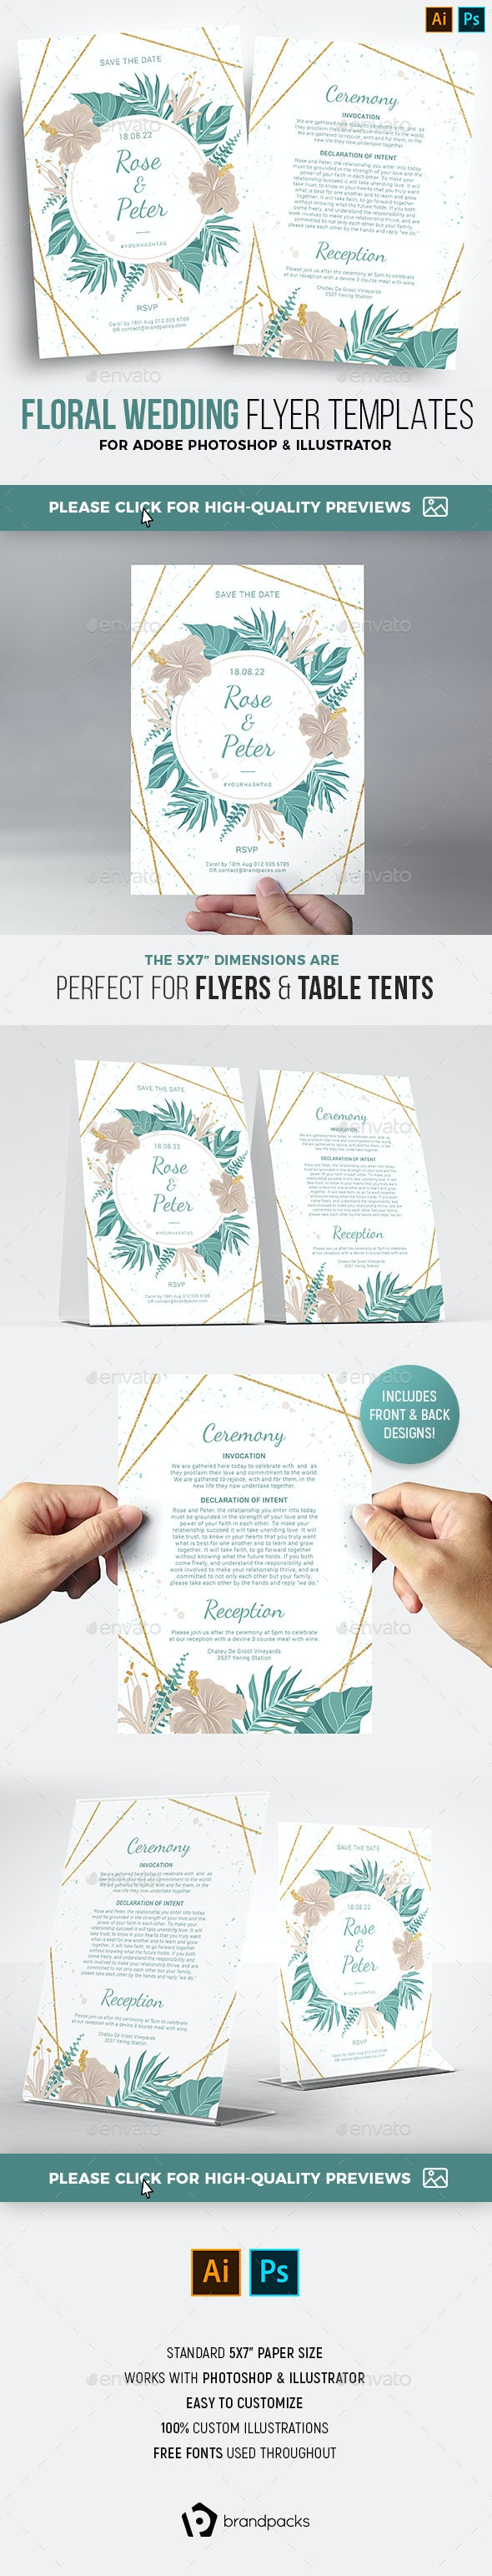 Wedding Invitation Templates - Weddings Cards & Invites